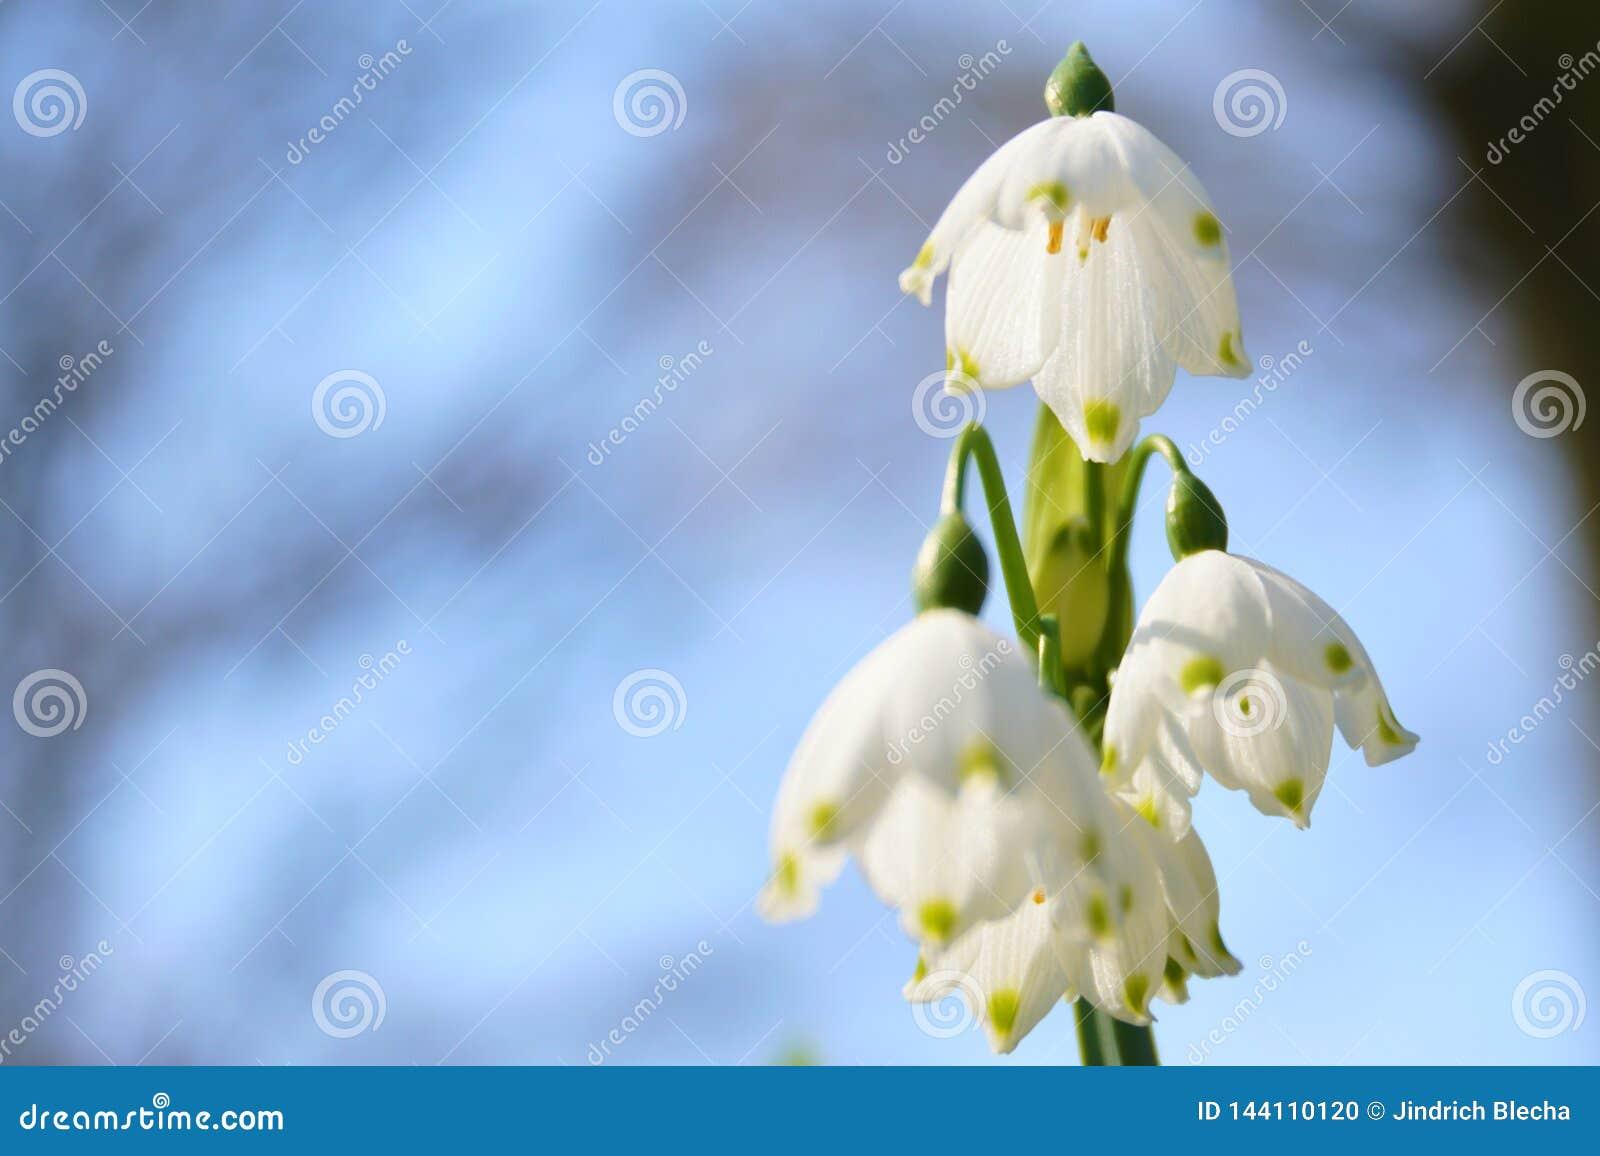 Sneeuwvlokbloem in bloesem